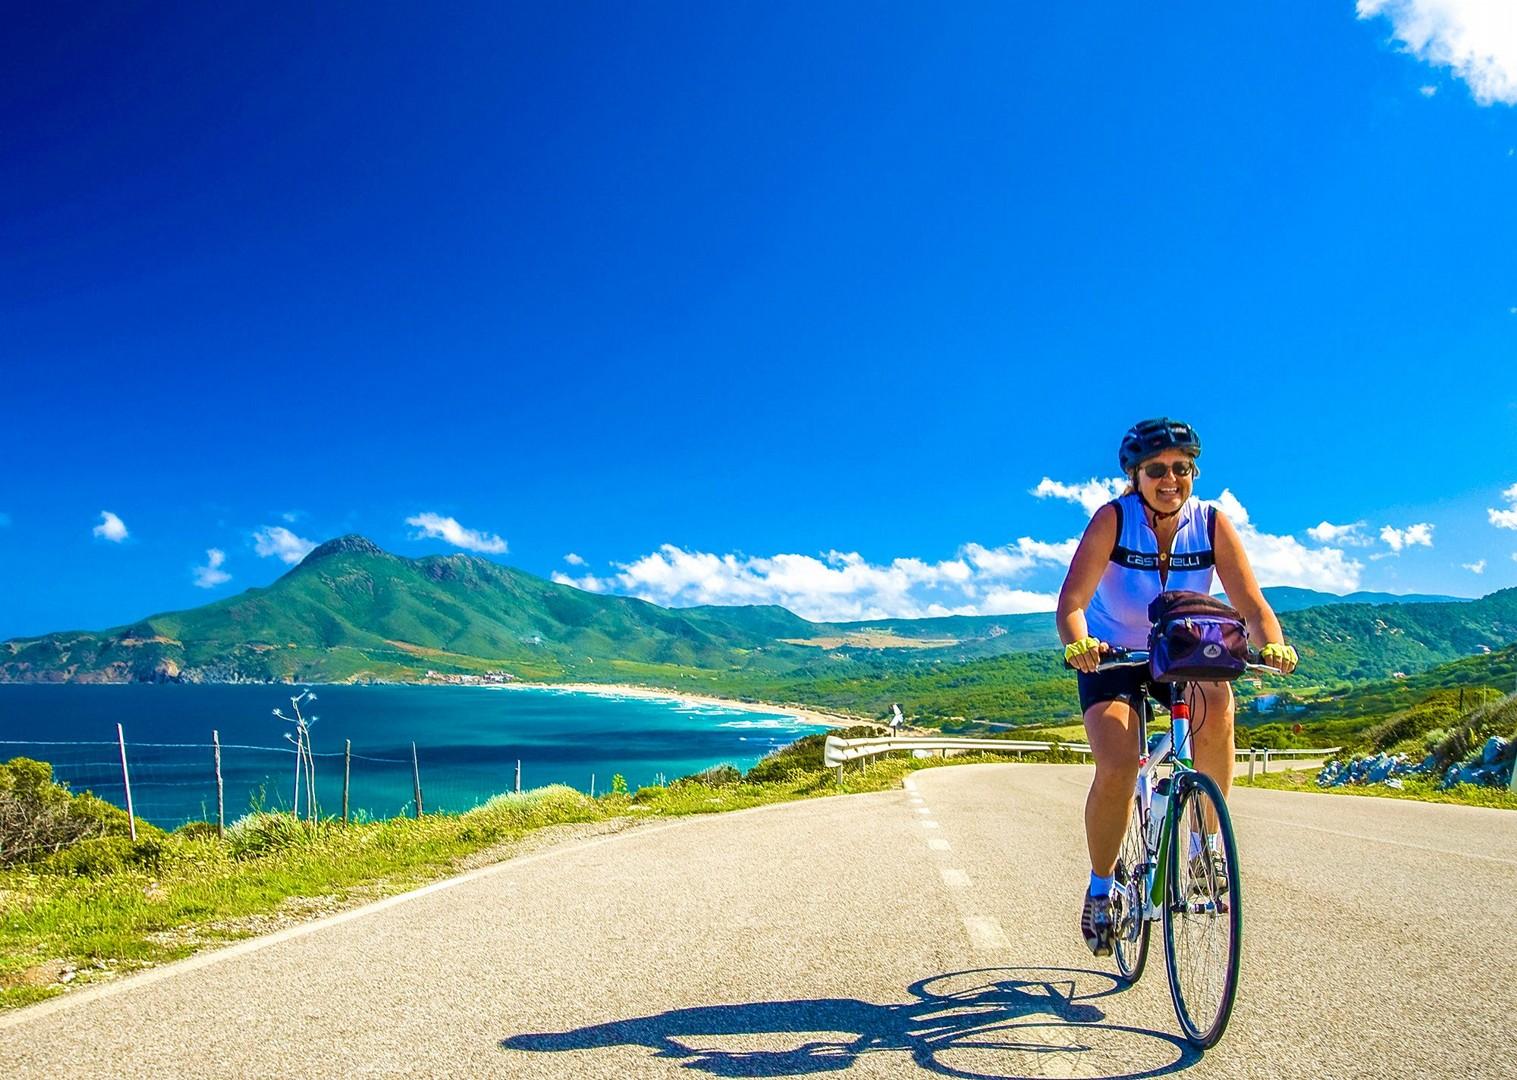 fdfsdfsdfsdfsdfsdf1.jpg - Italy - Sardinia - Island Flavours - Italia Leisure and Family Cycling